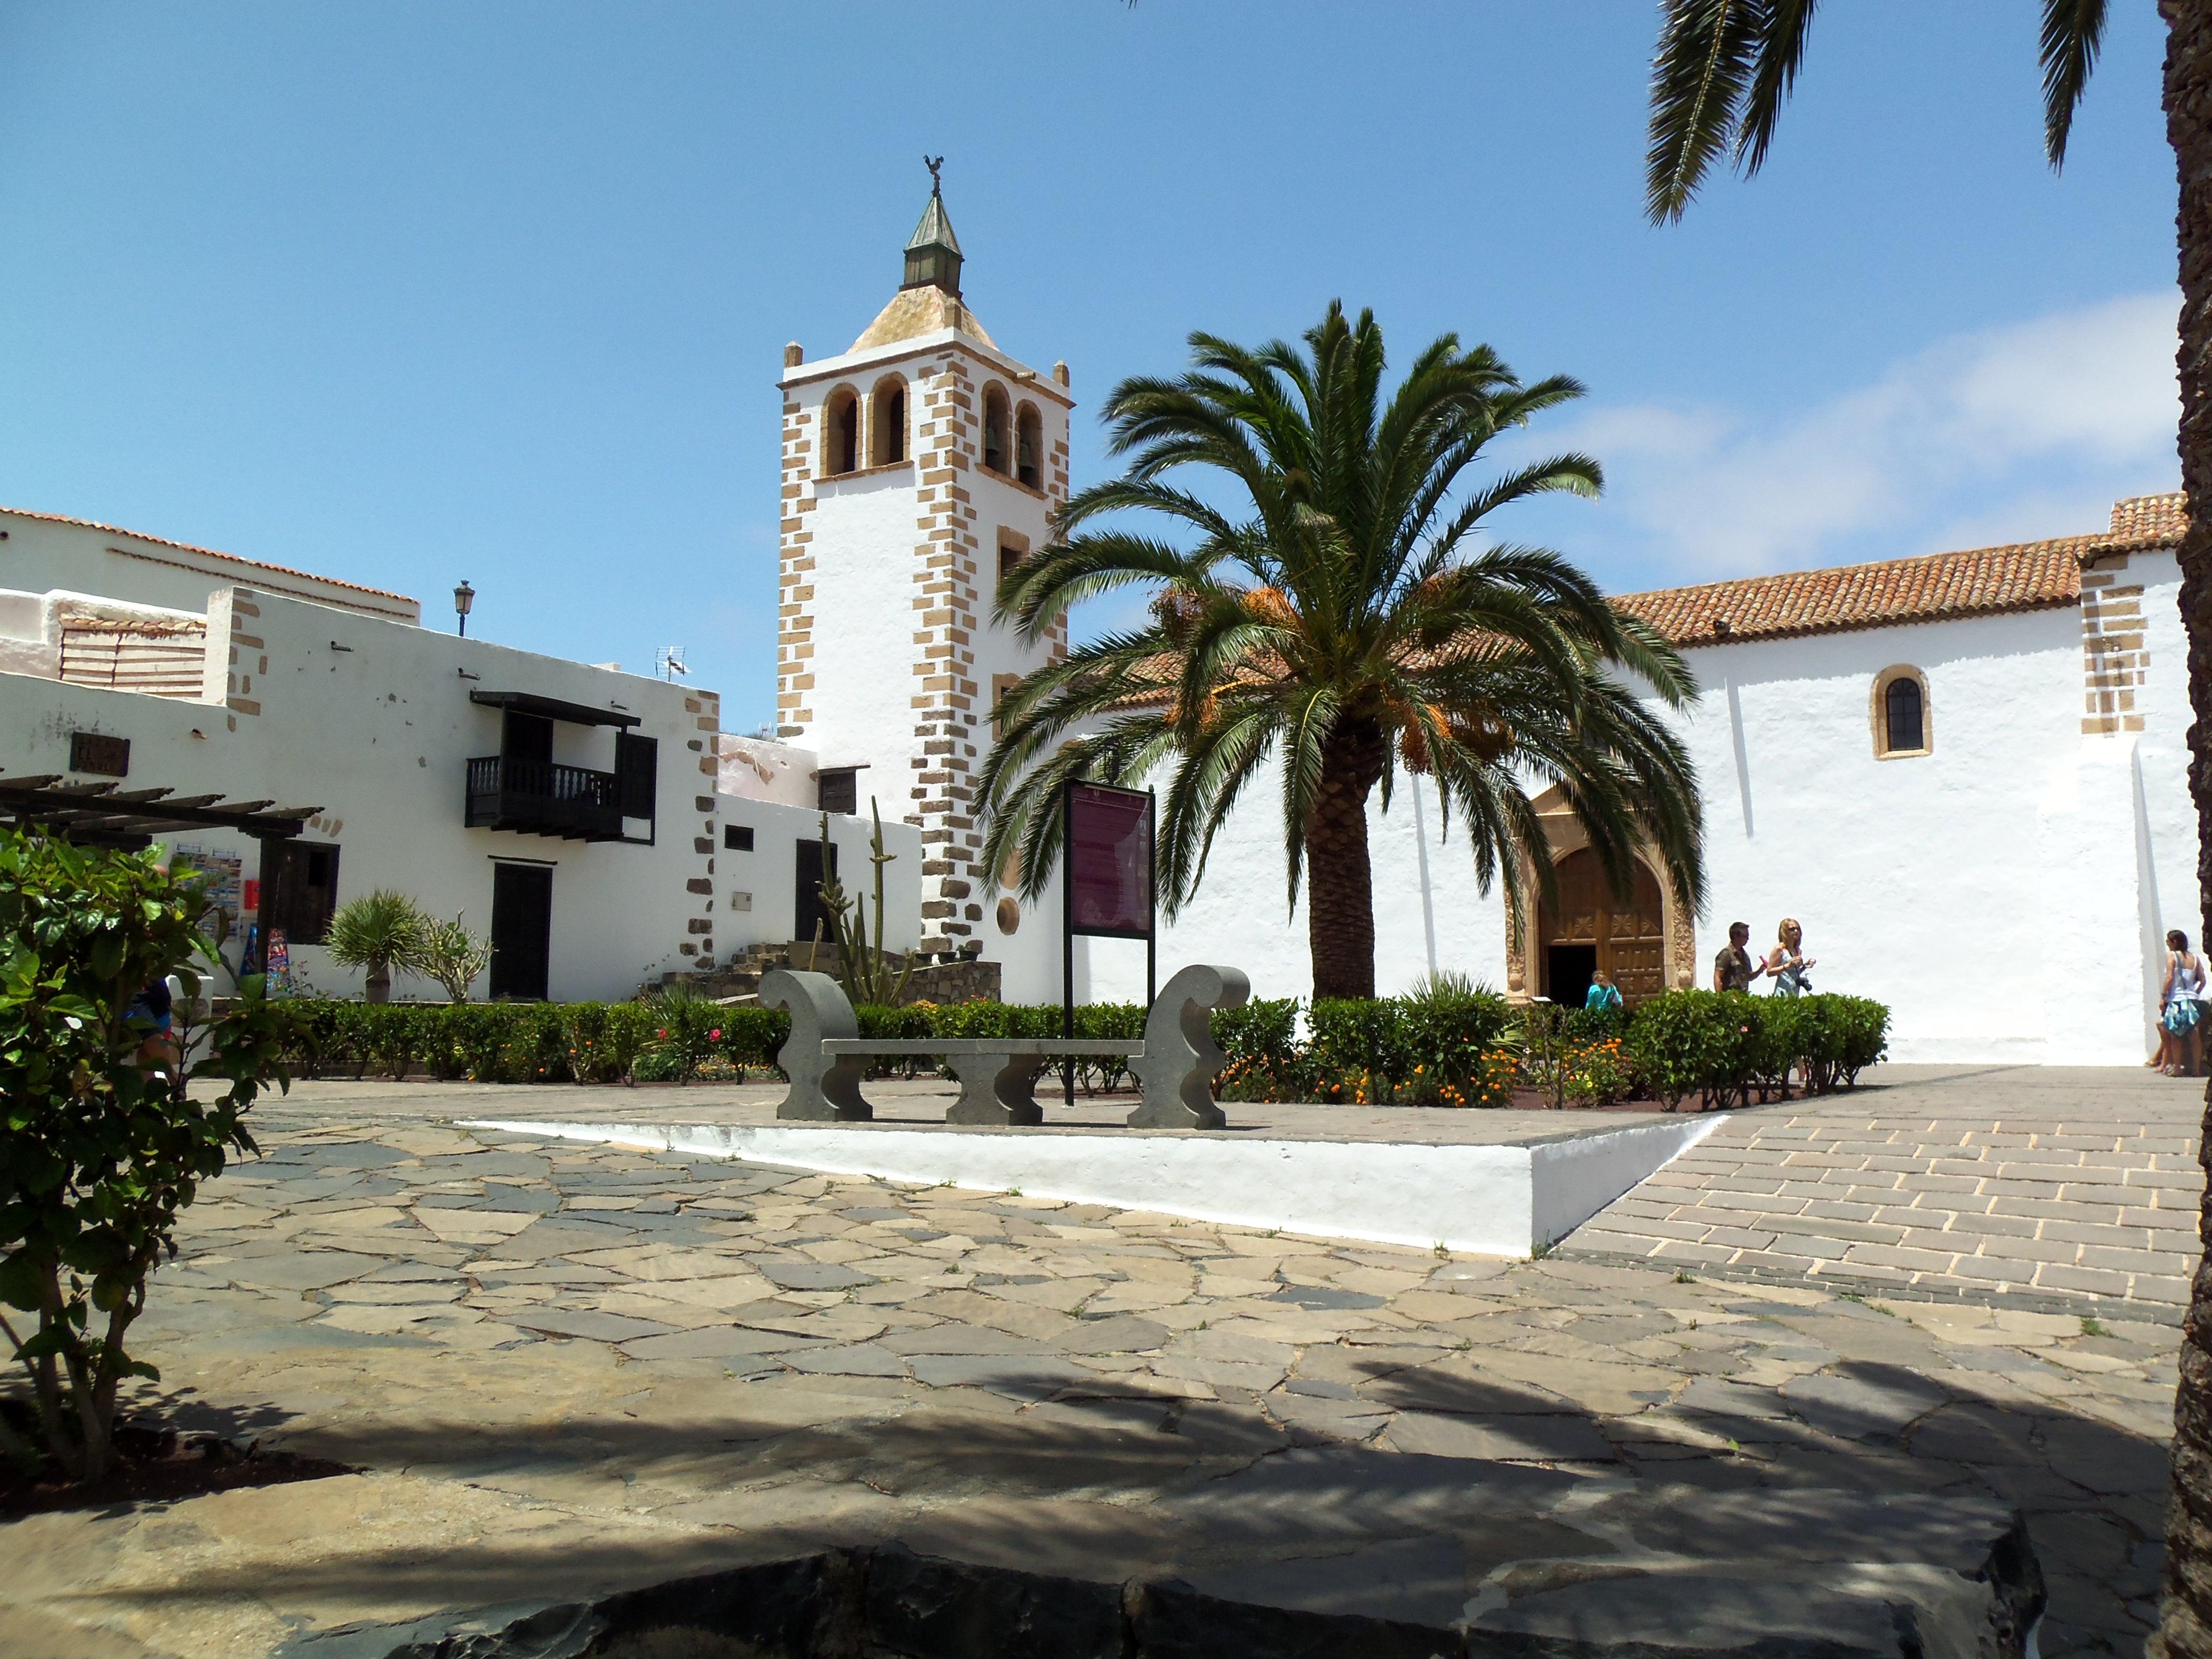 Platz 16: Fuerteventura, Spanien